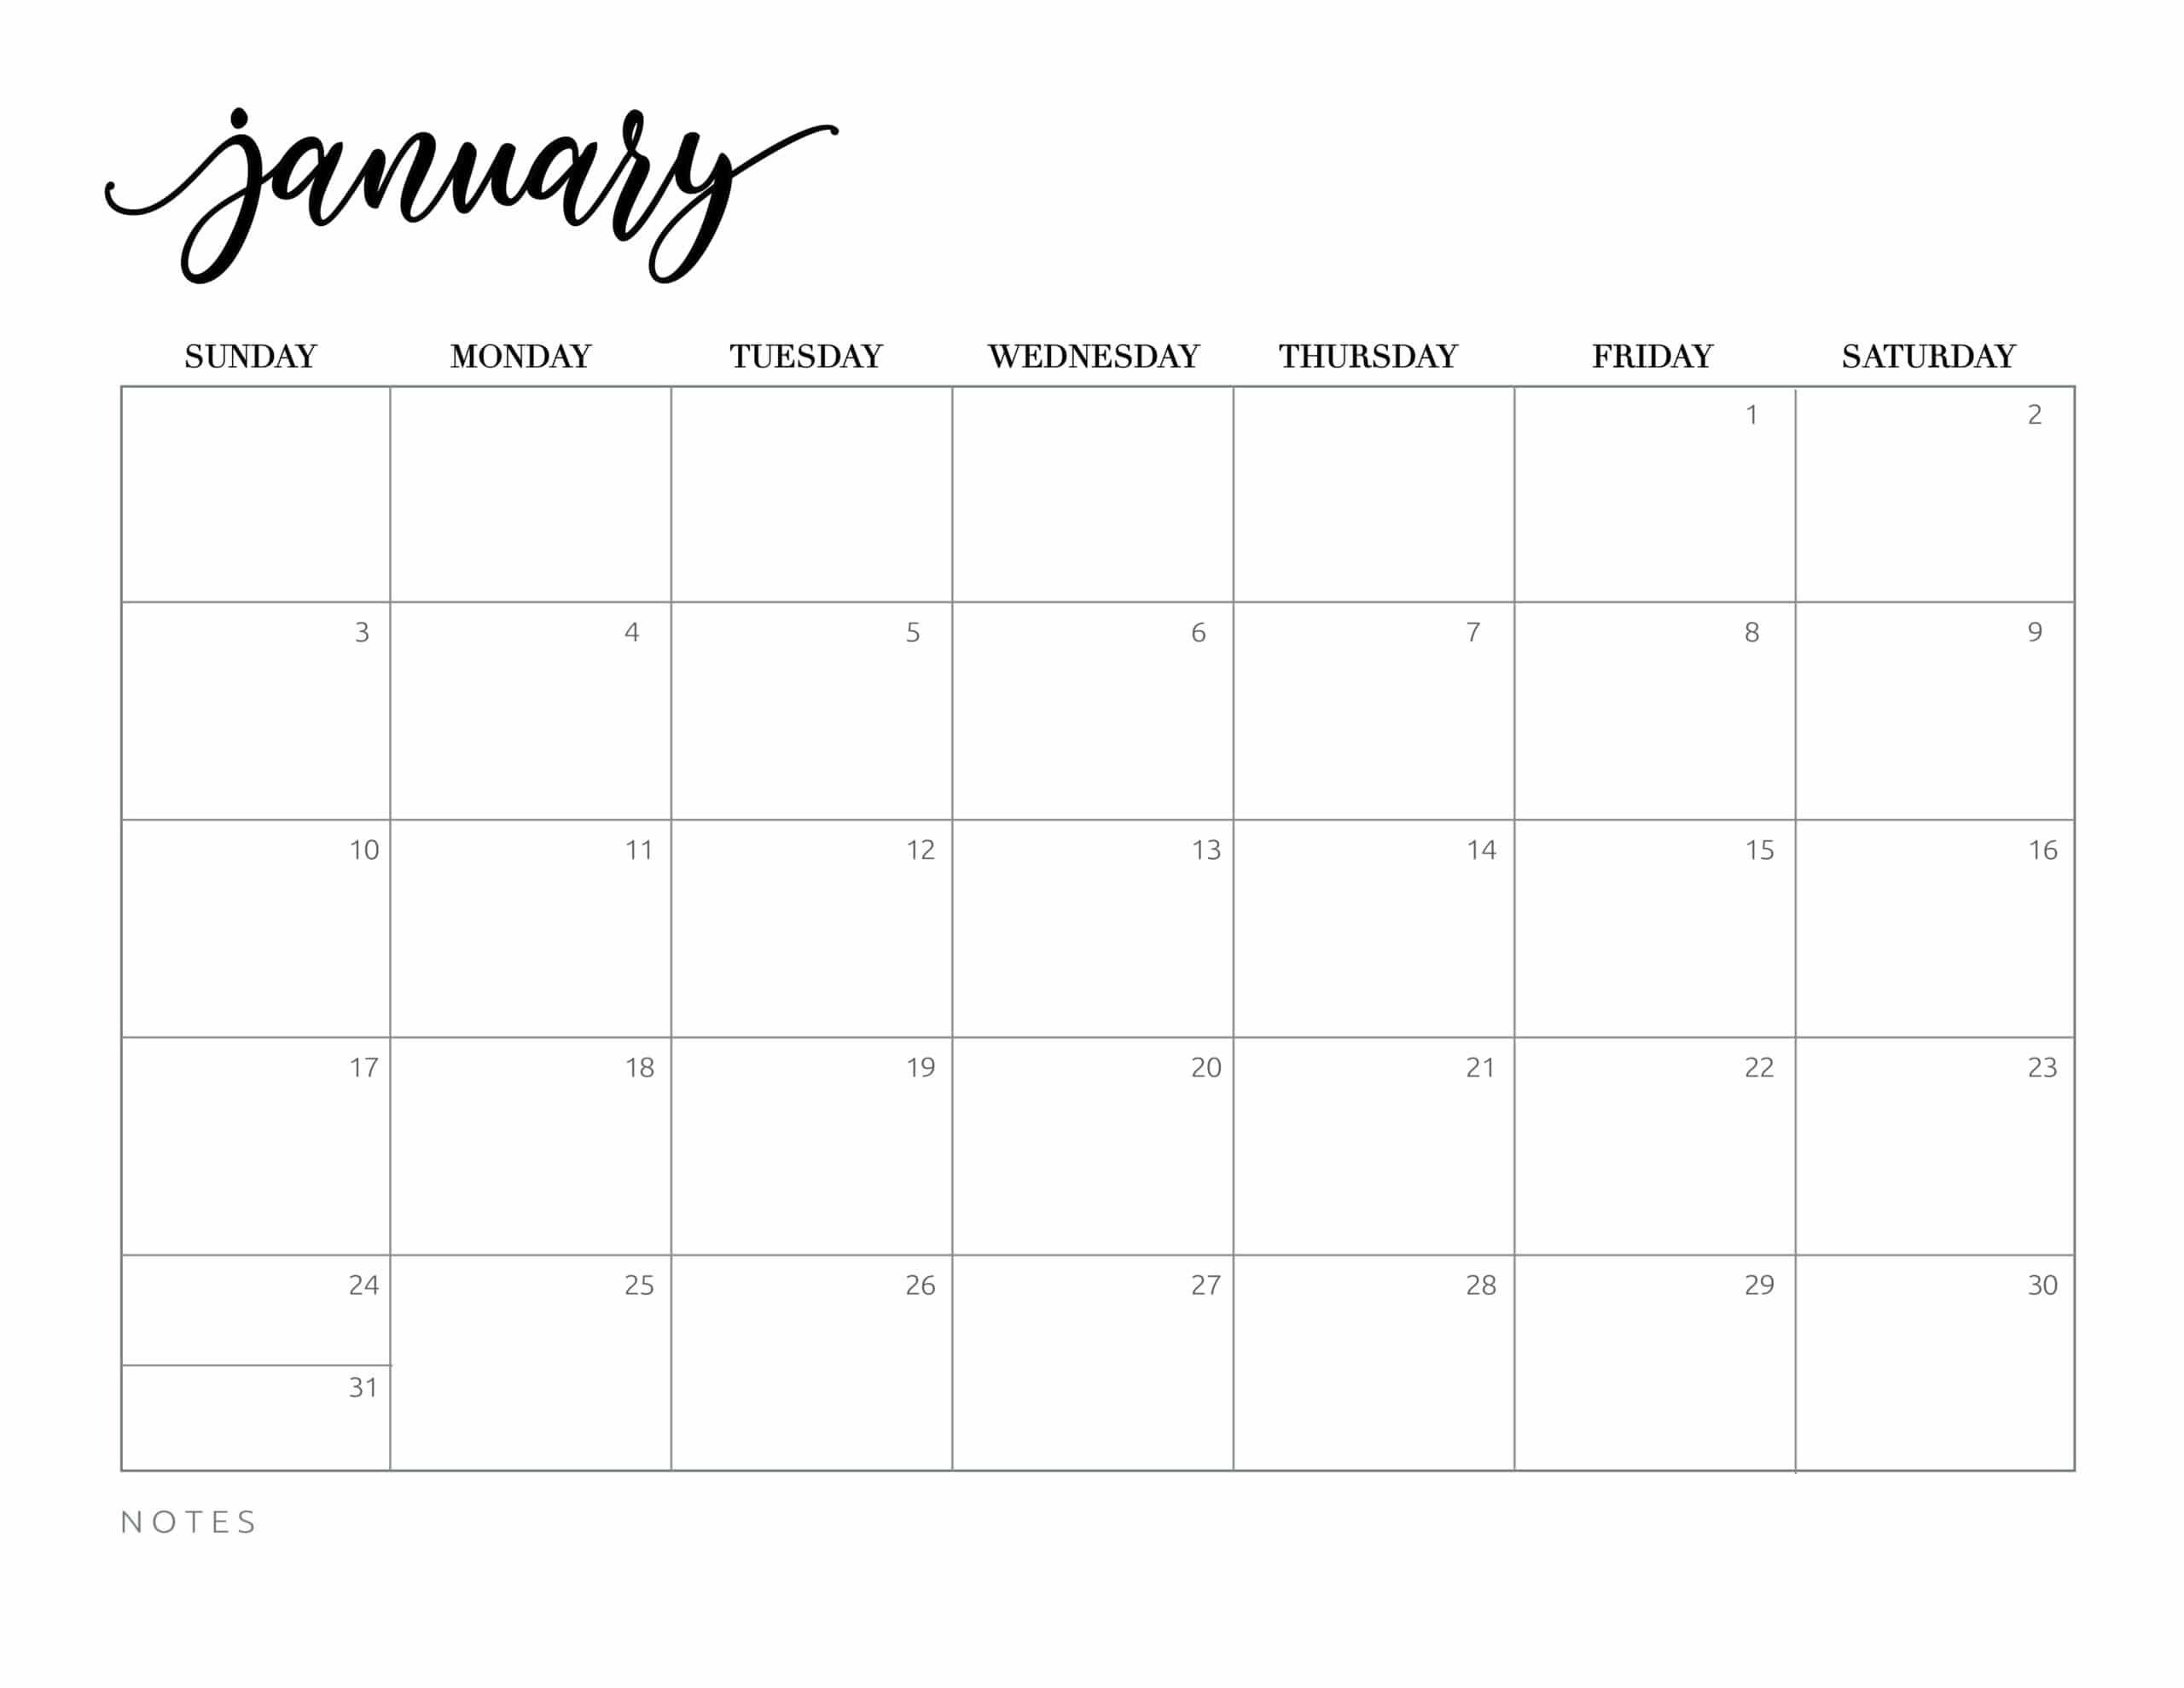 Free Printable 2021 Calendar - World of Printables